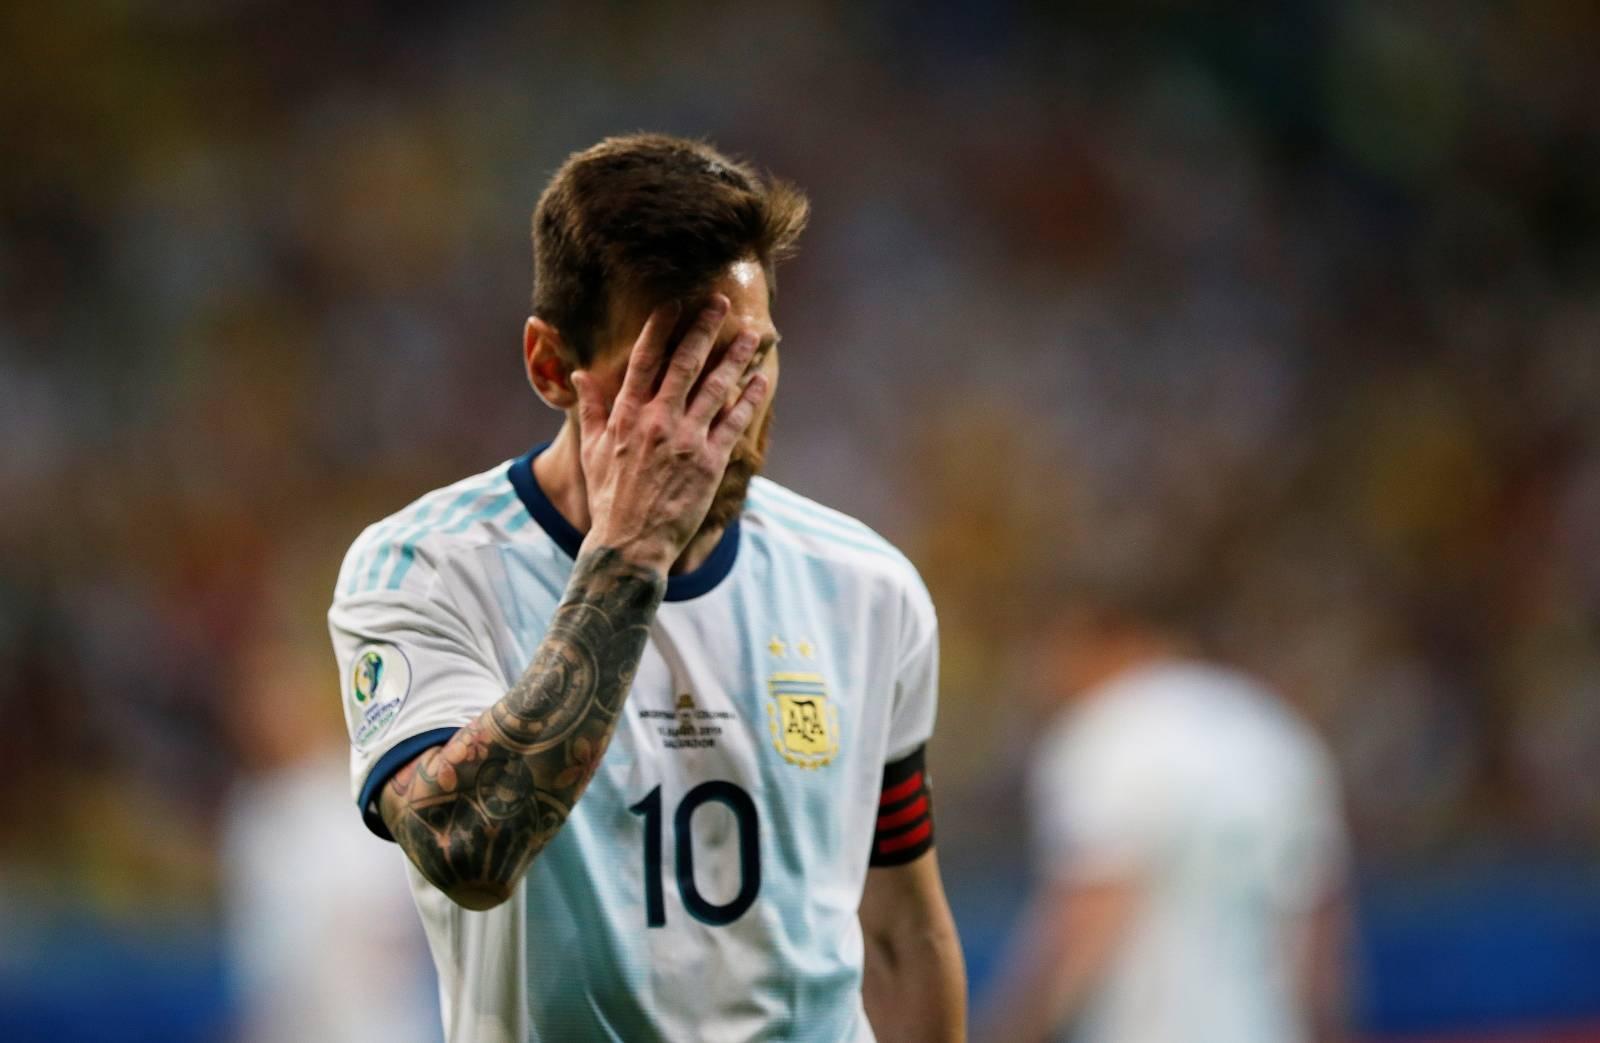 Copa America Brazil 2019 - Group B - Argentina v Colombia